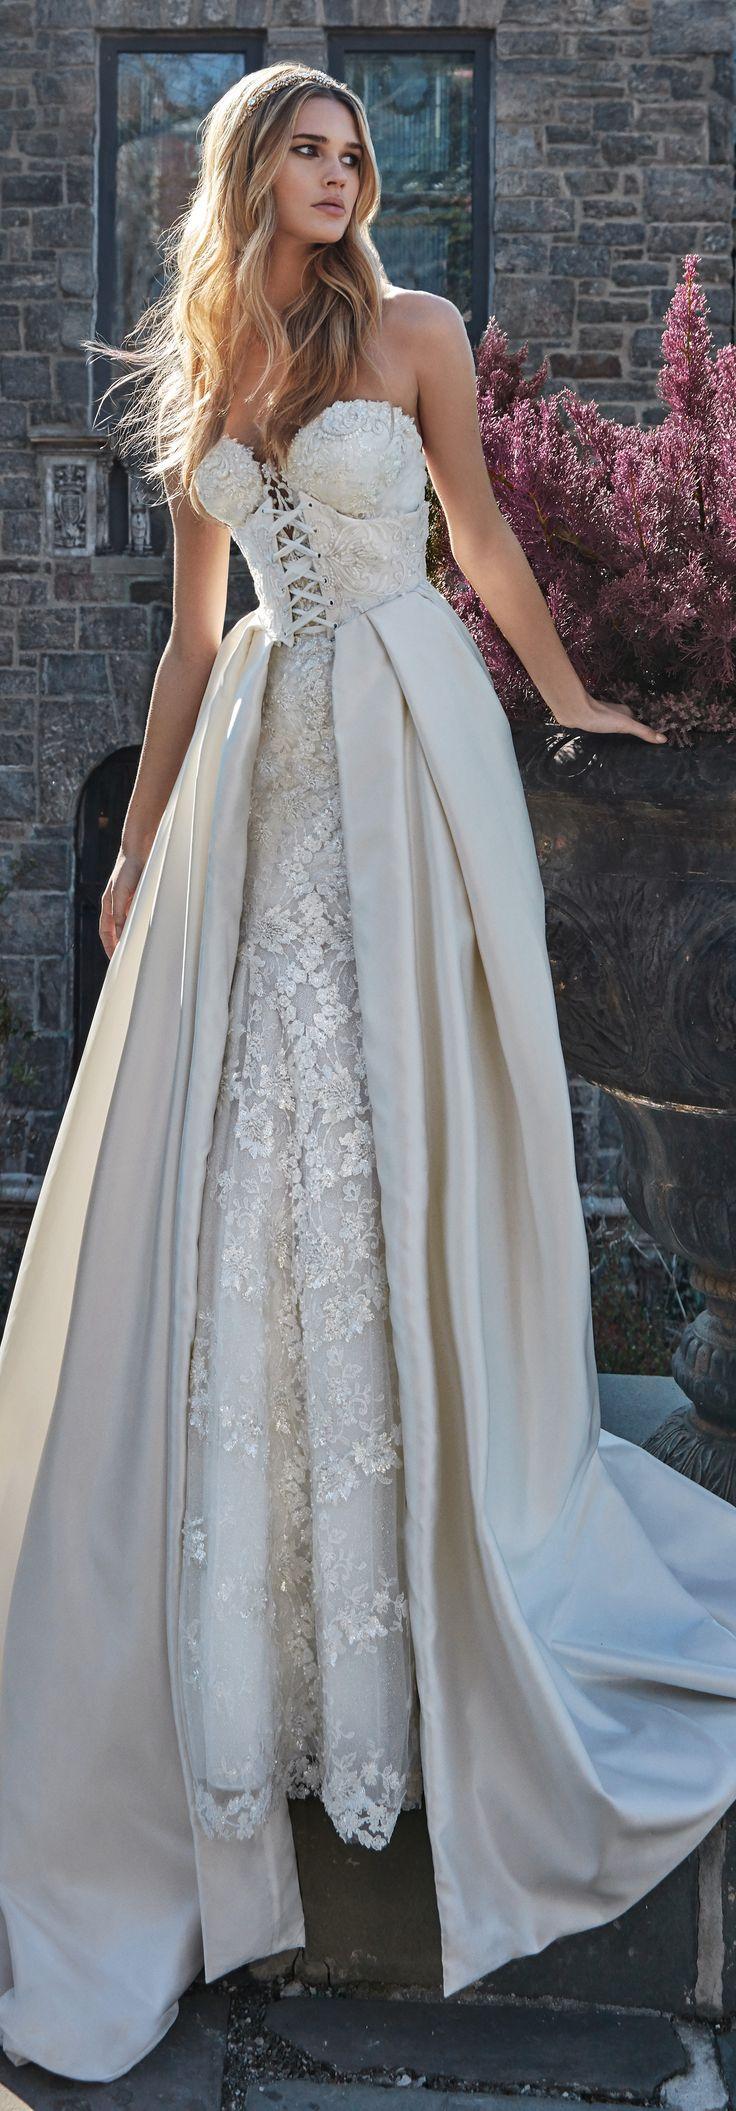 زفاف - Strapless Stylish Dress